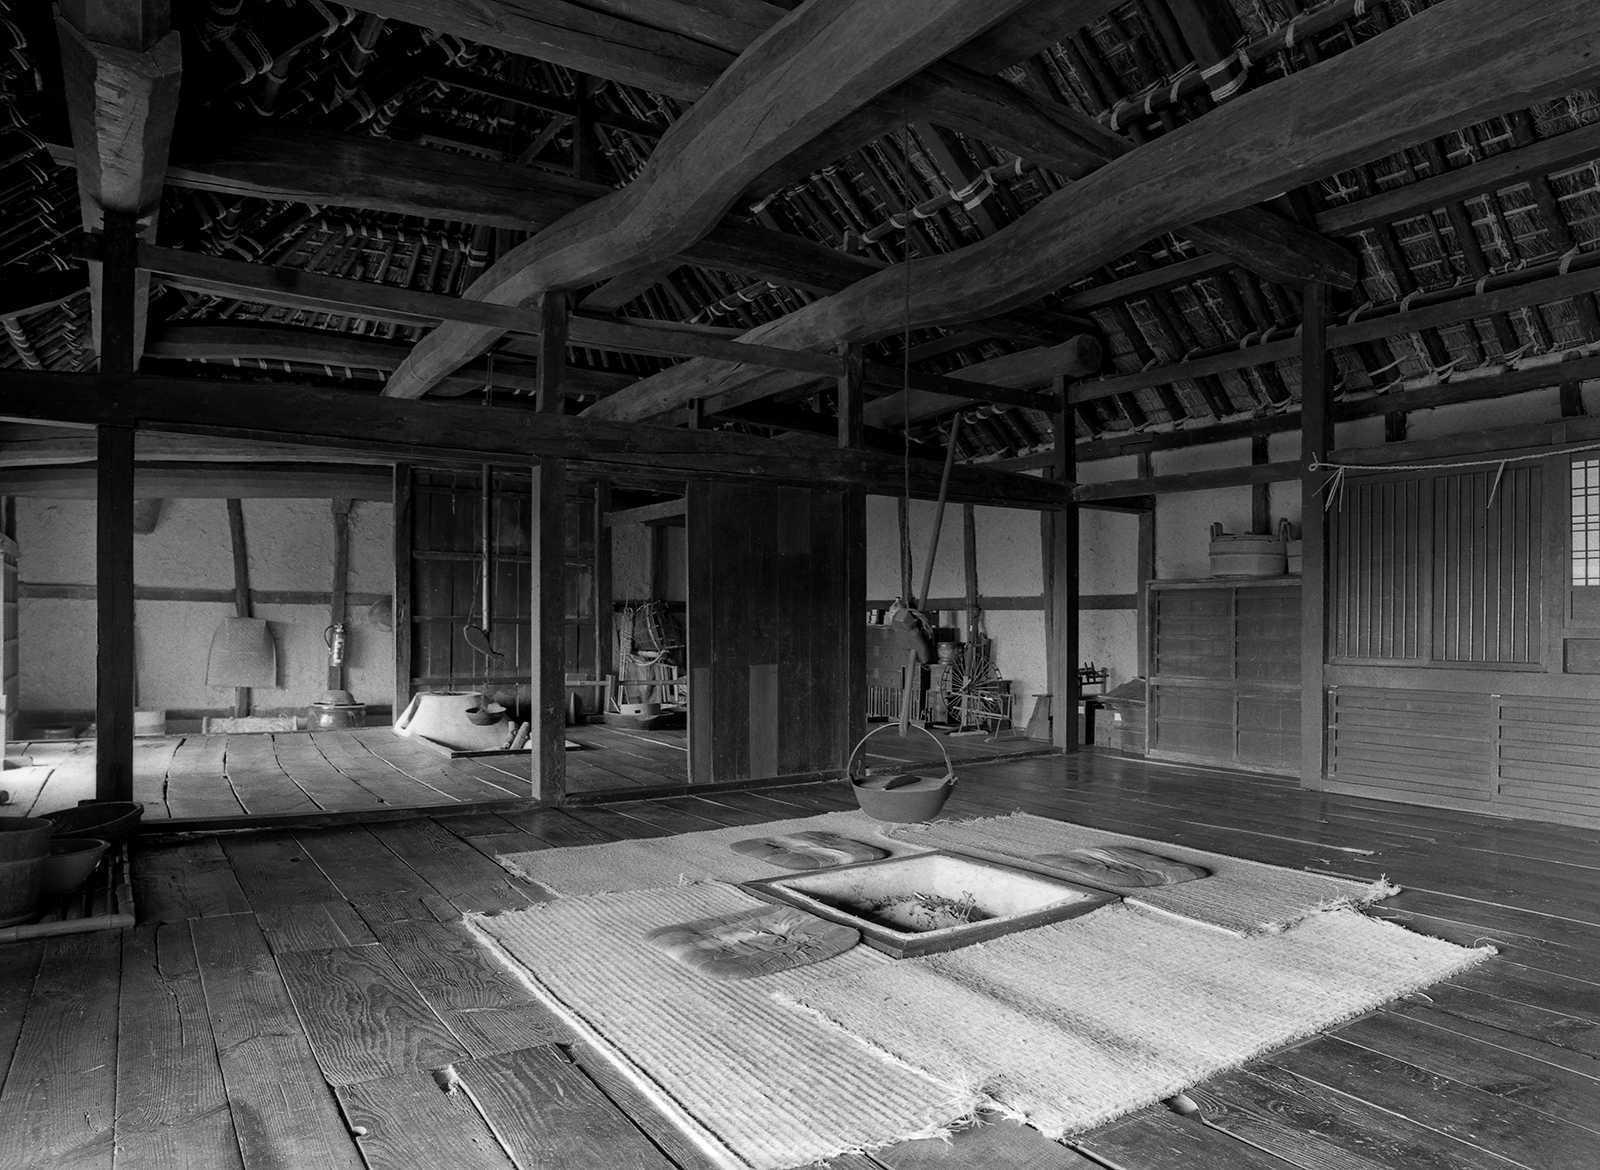 Shikoku Mura, Japan, 1979. The same interior space photographed straight on and form the corners.